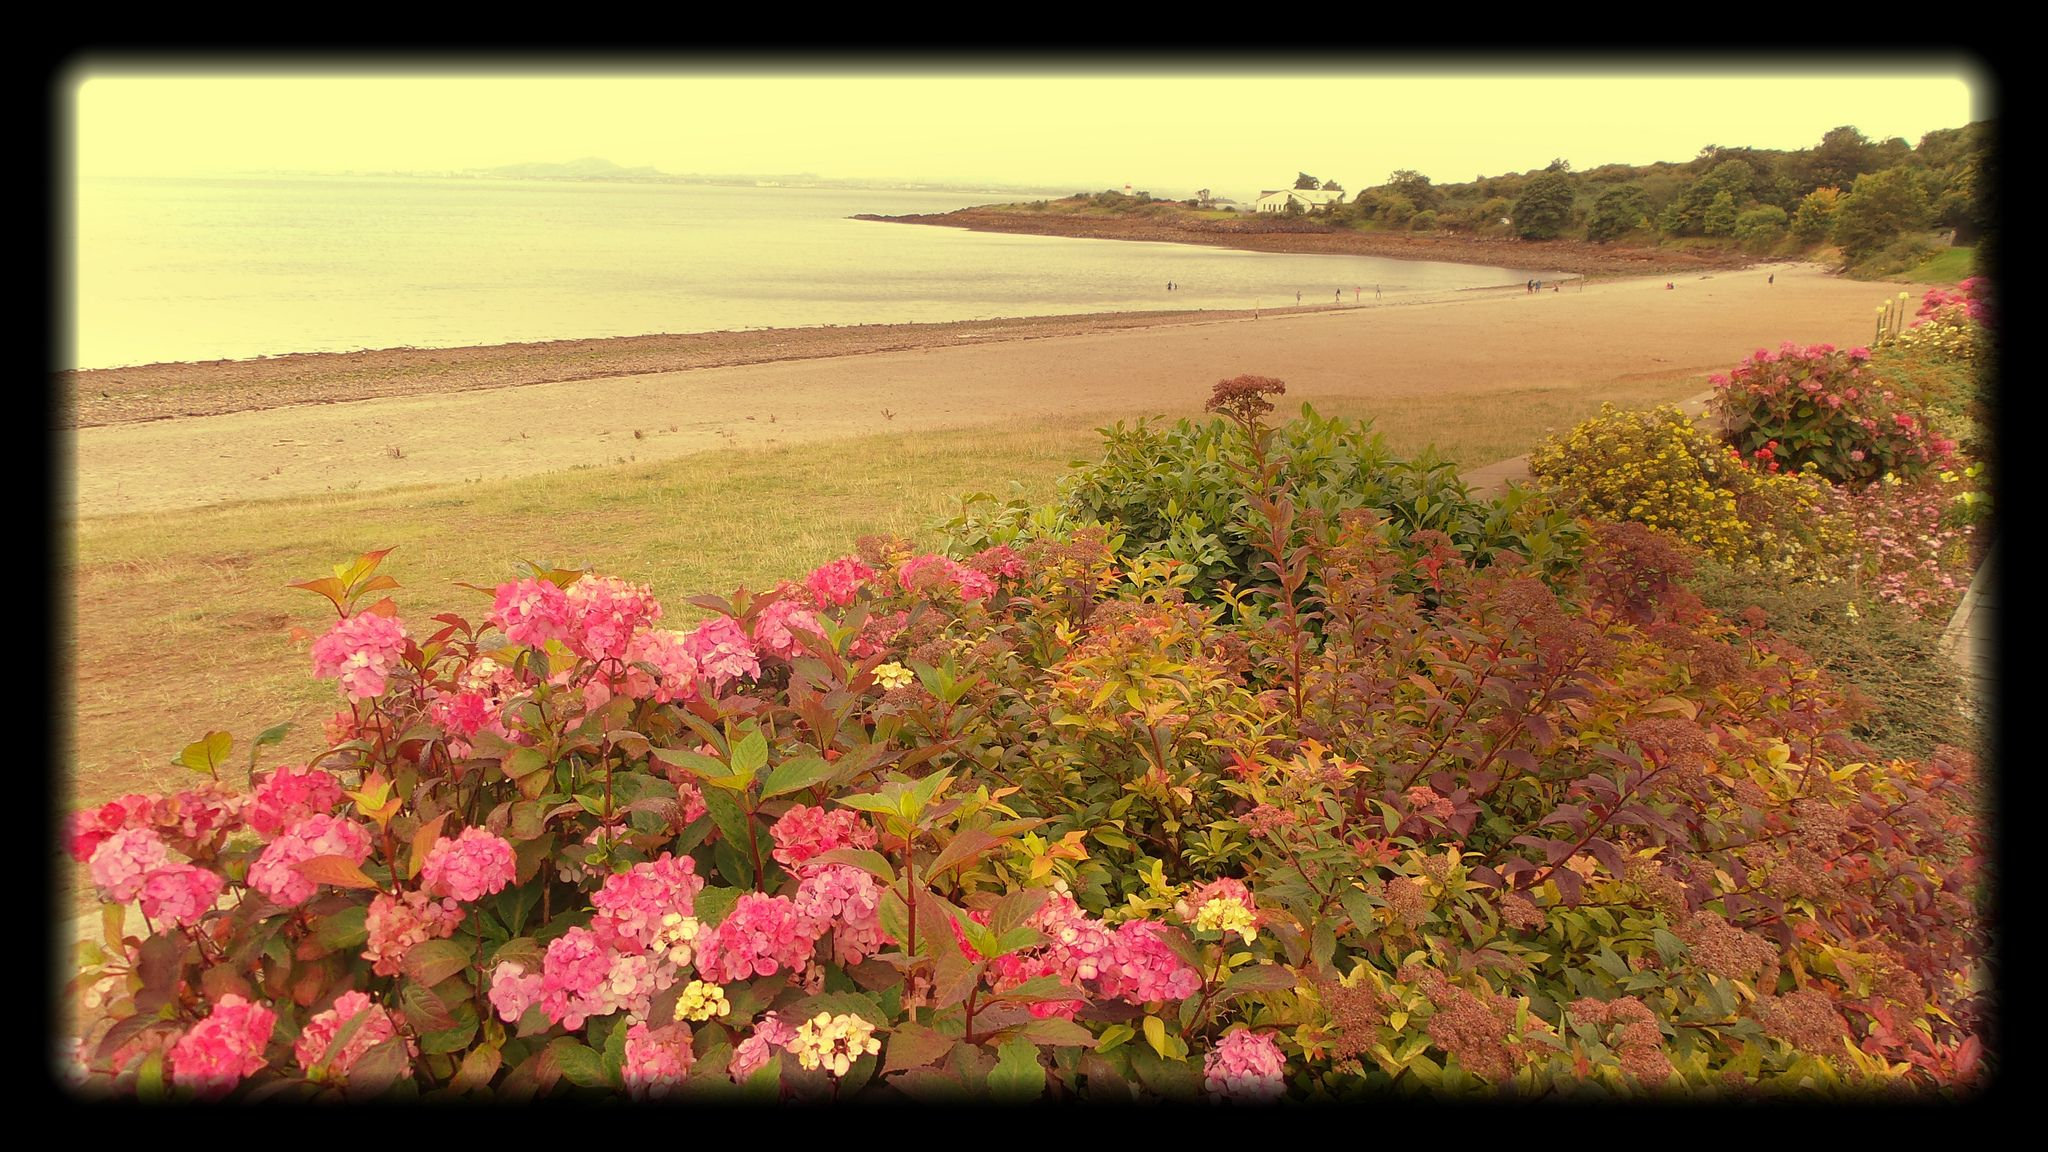 Garden bed with trees  Flower bed at Sliver Sands Beach in Aberdour Scotland  Sand beach